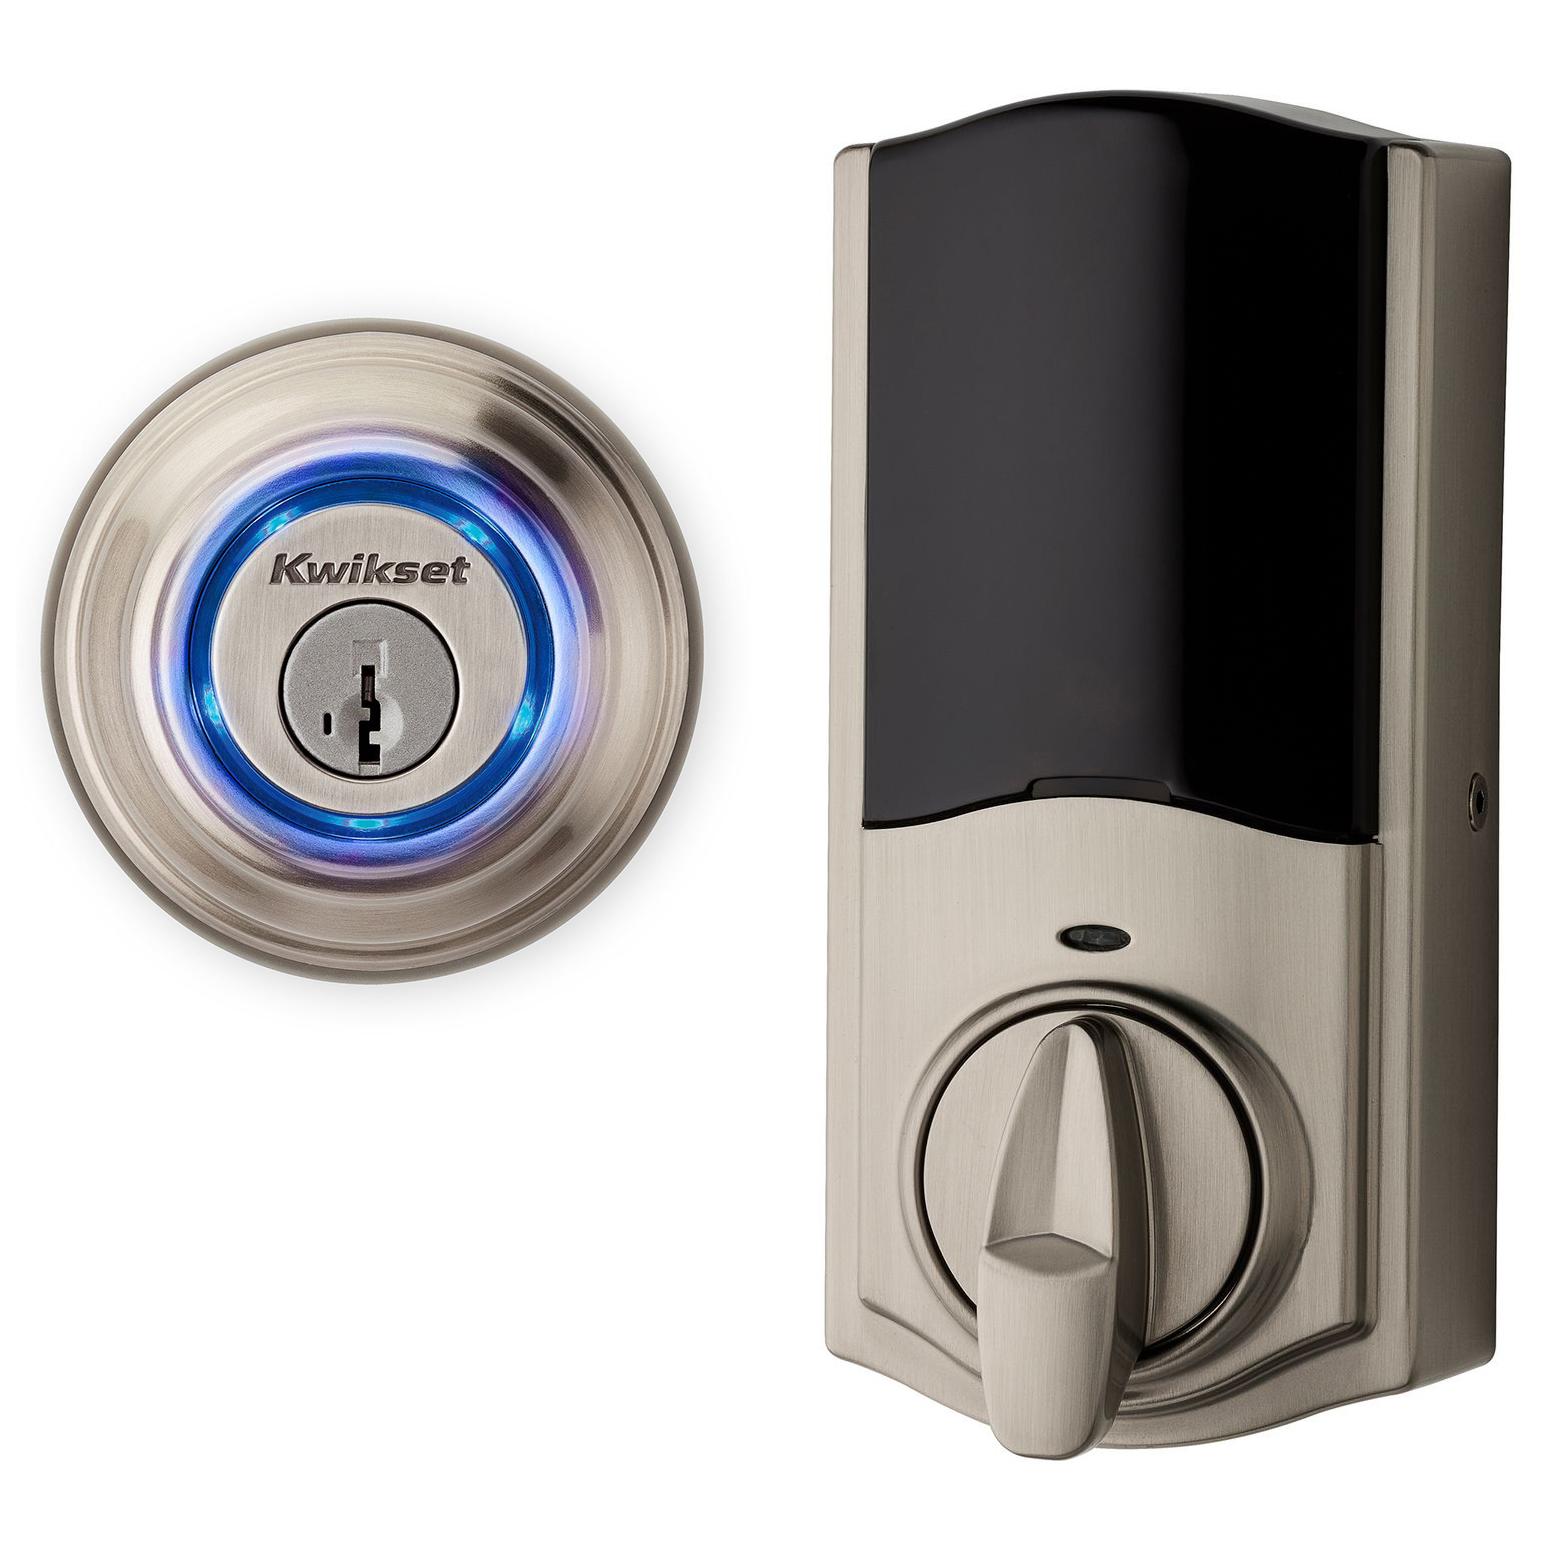 Kwikset 99250-202 Satin Nickel Kevo 2nd Gen Touch-To-Open™ Bluetooth Key & Electronic Smart Door